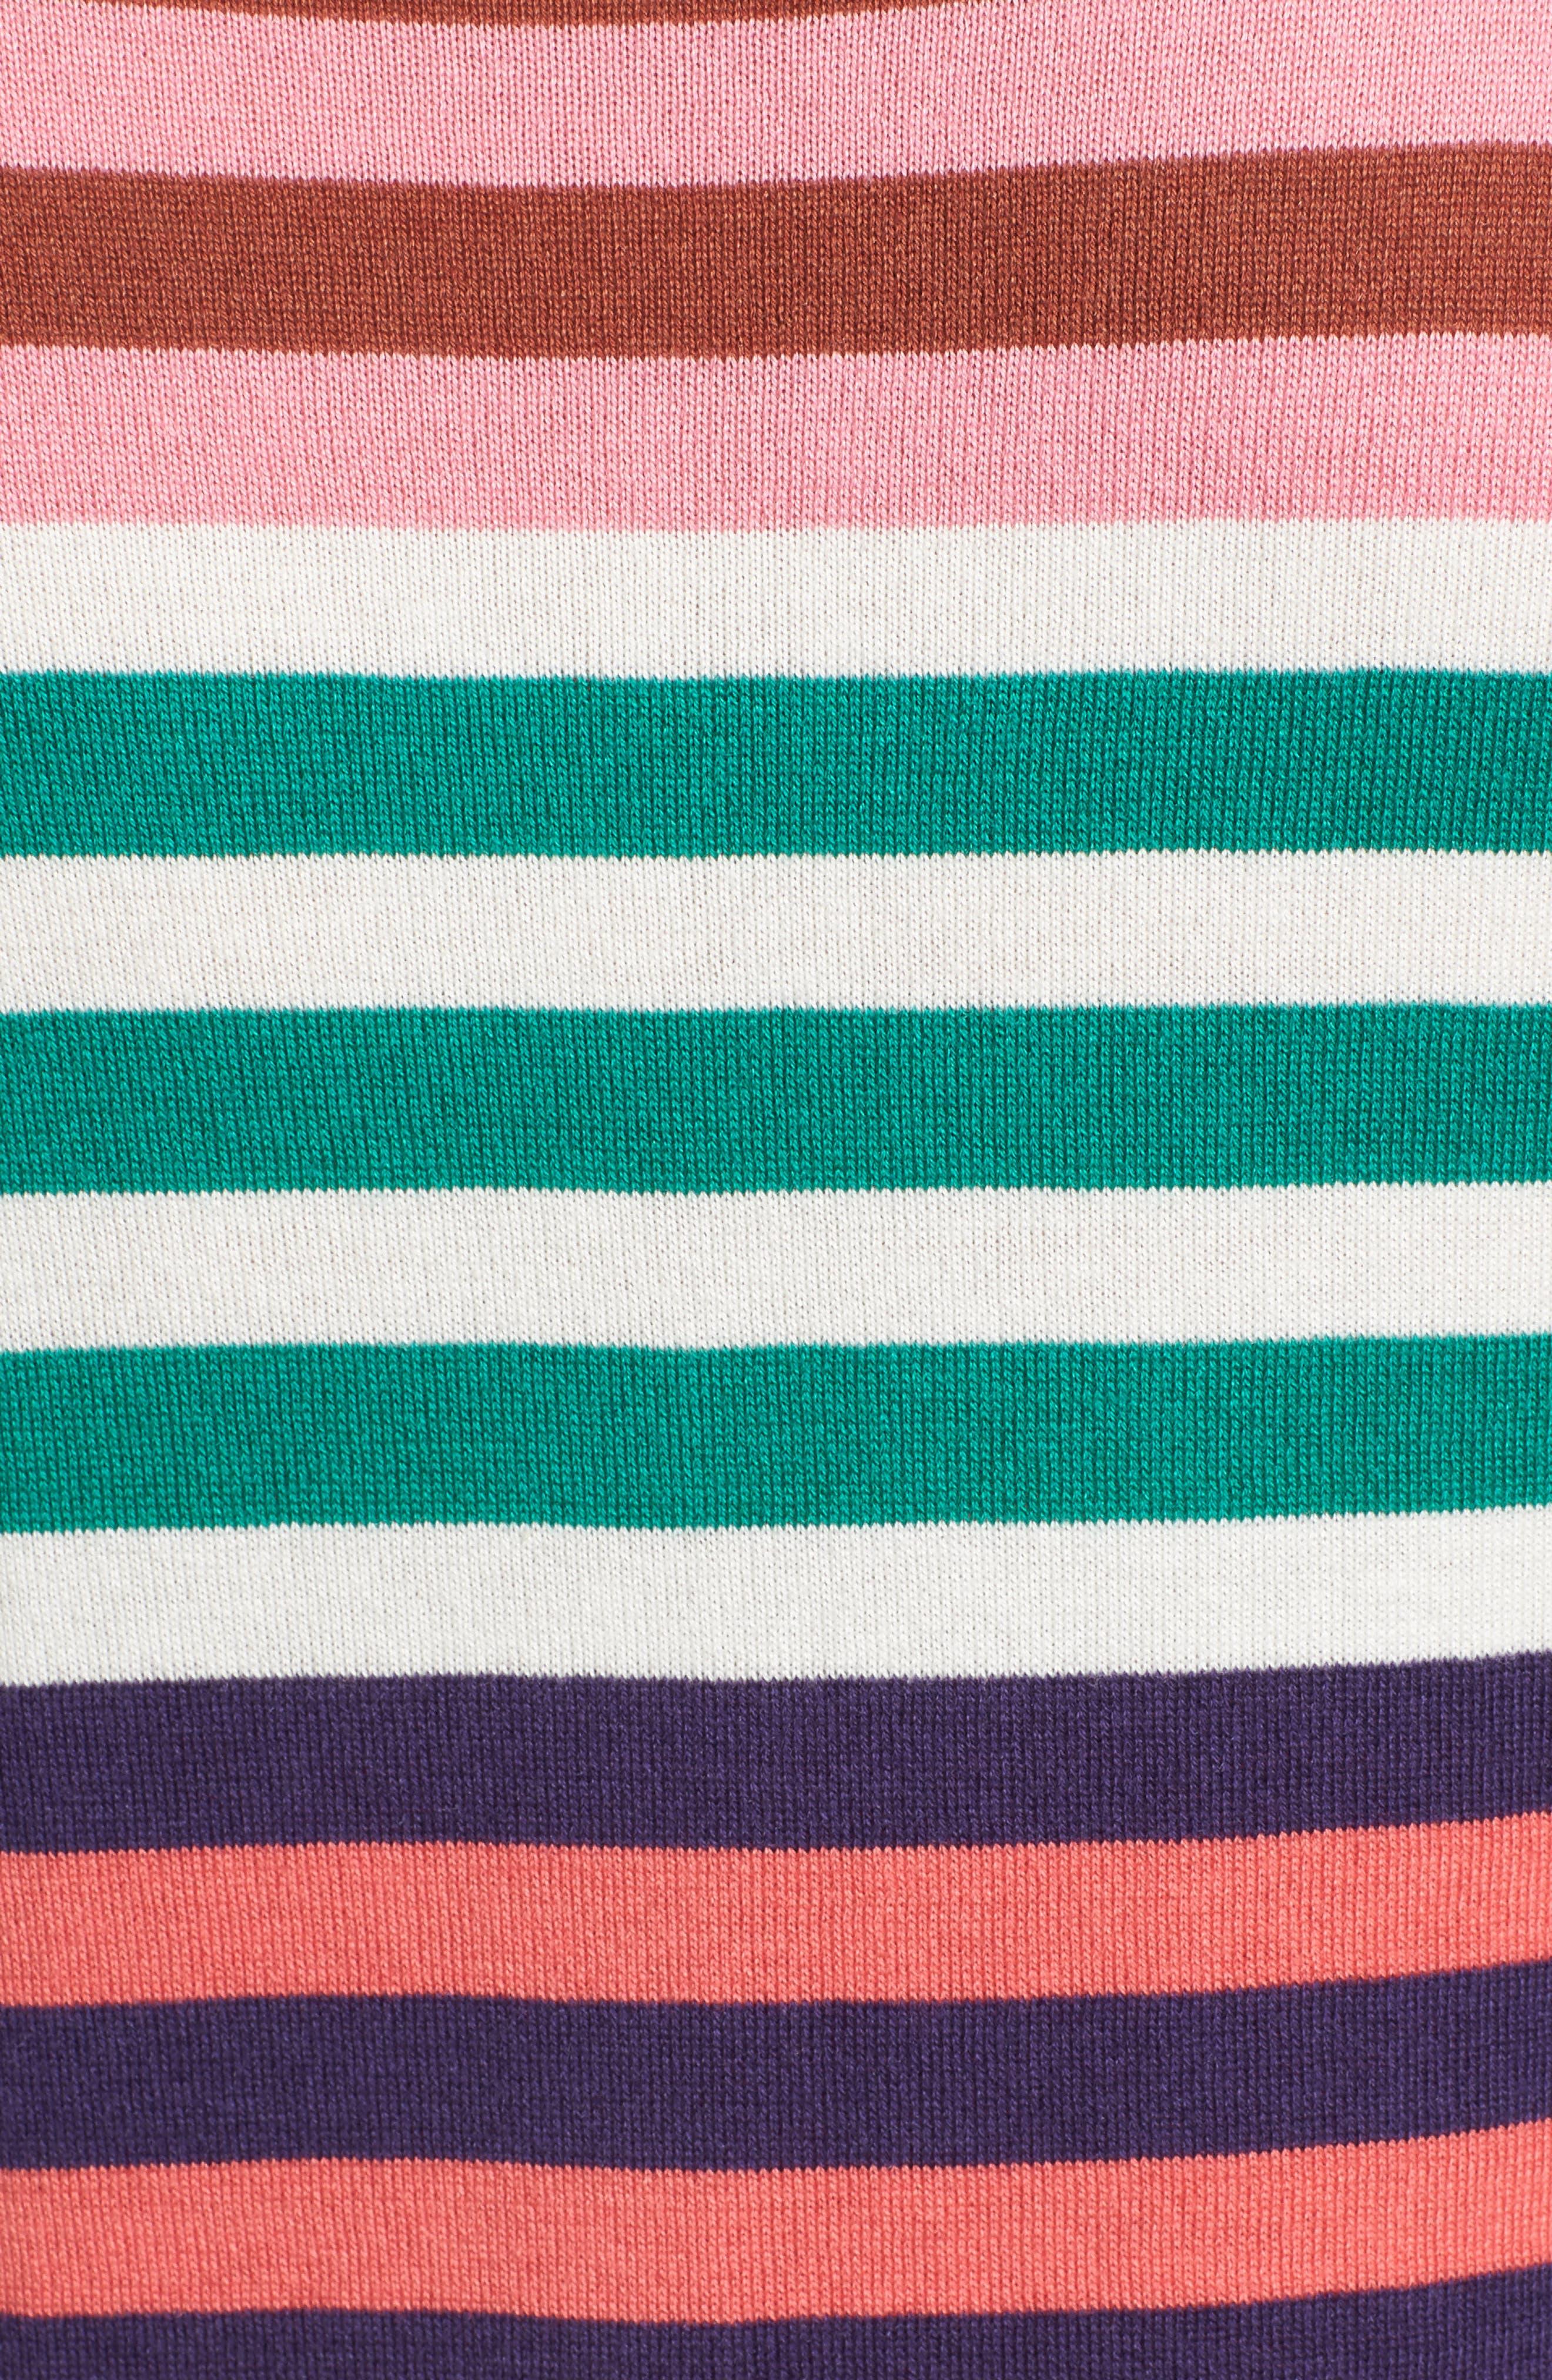 Colorblock Stripe Sweater,                             Alternate thumbnail 19, color,